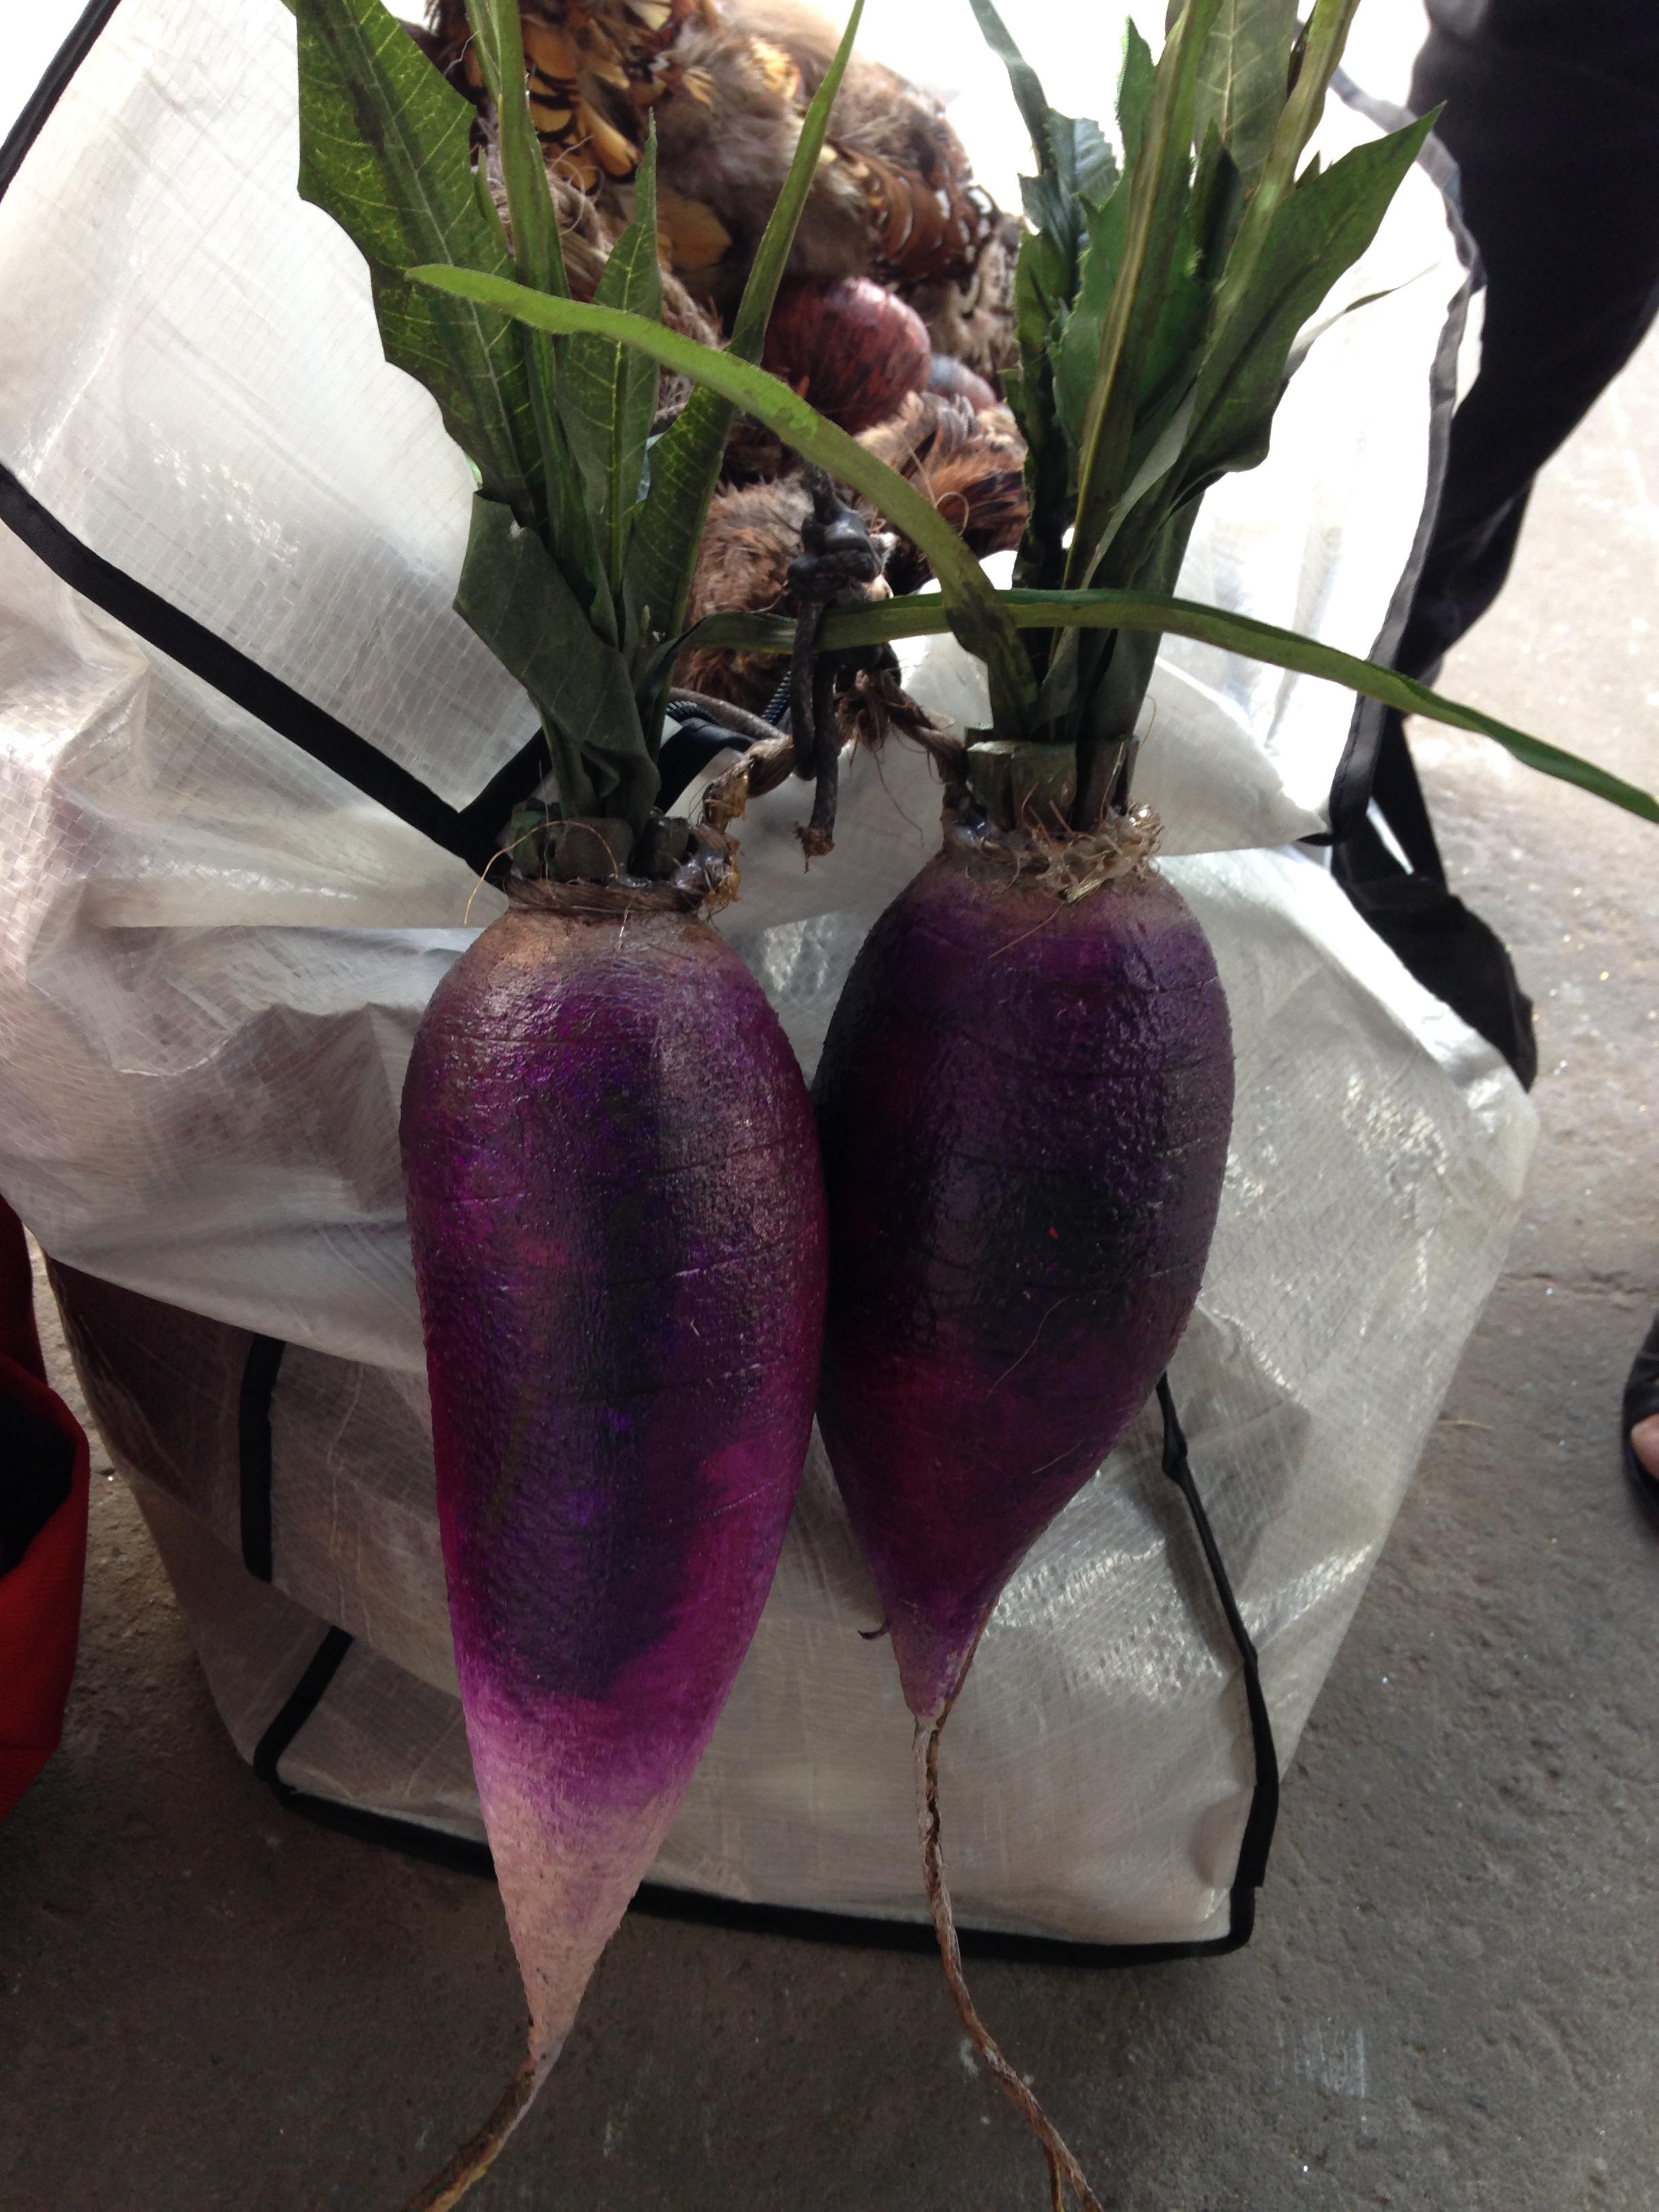 Turnips, Les Mis